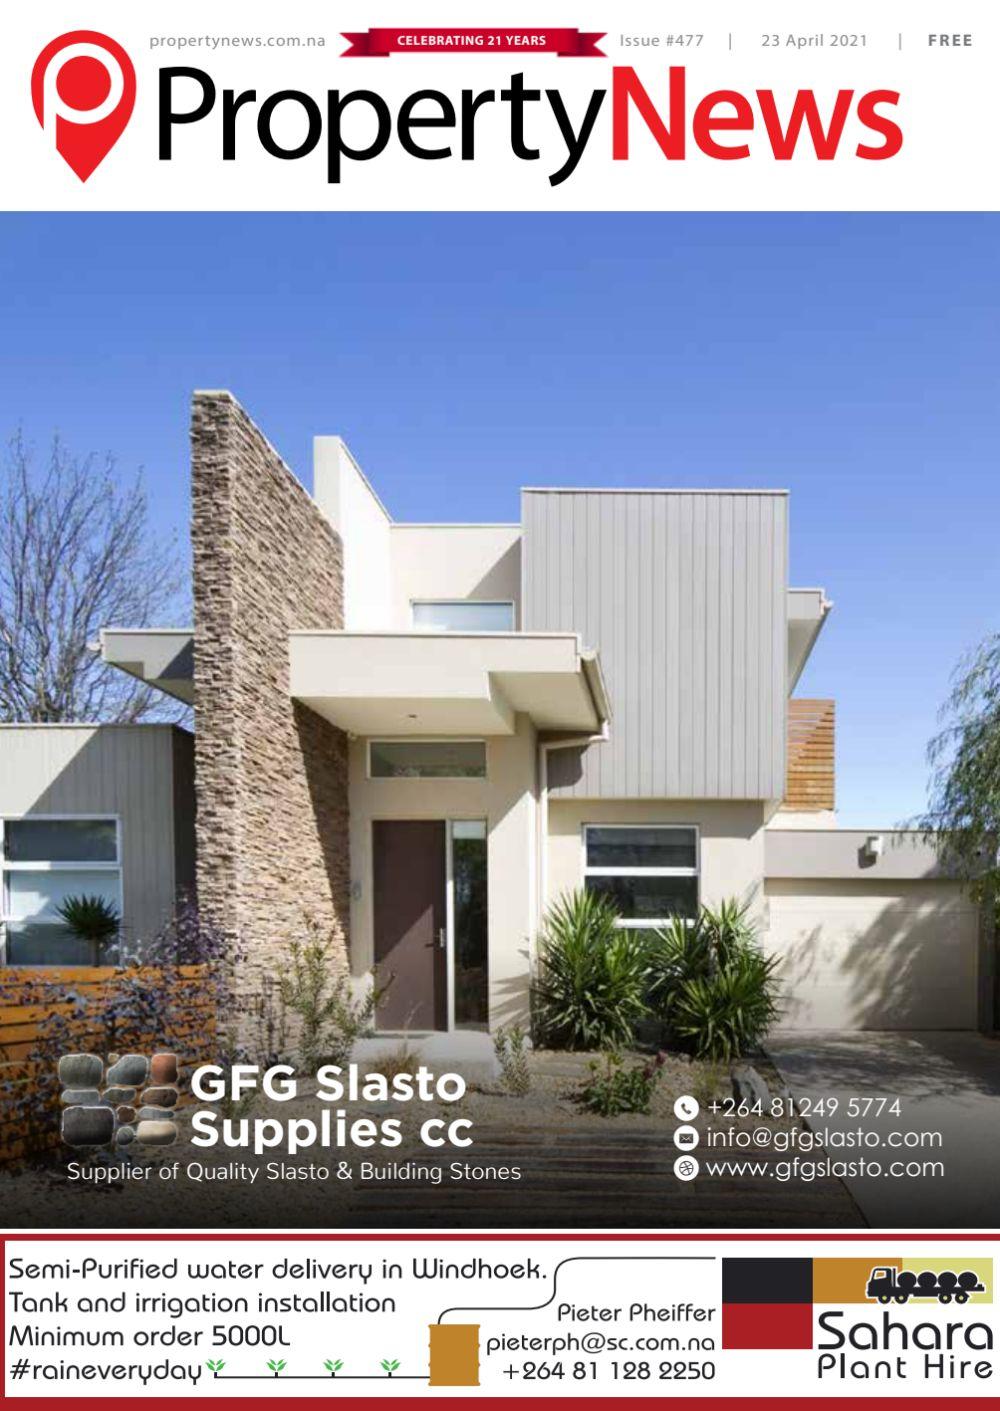 Property News Namibia Magazine Issue 477 - 23 Apr 2021